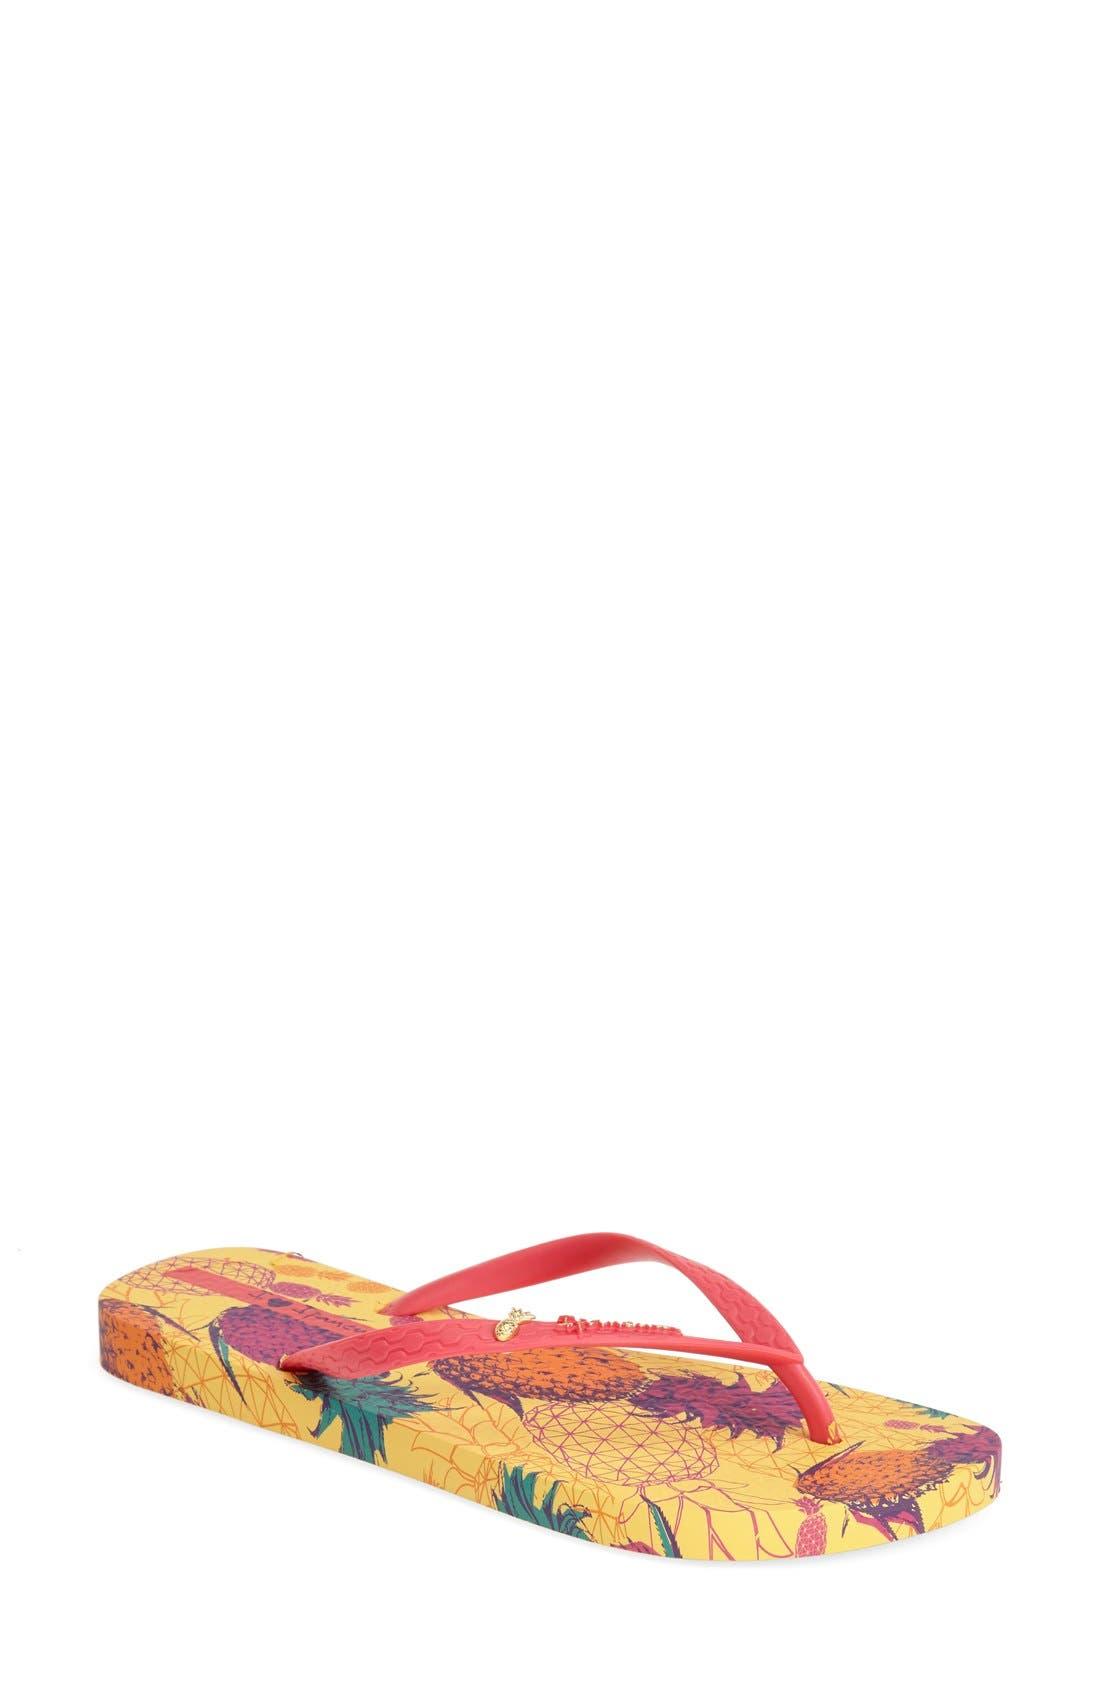 Alternate Image 1 Selected - Ipanema 'Piña' Flip Flop